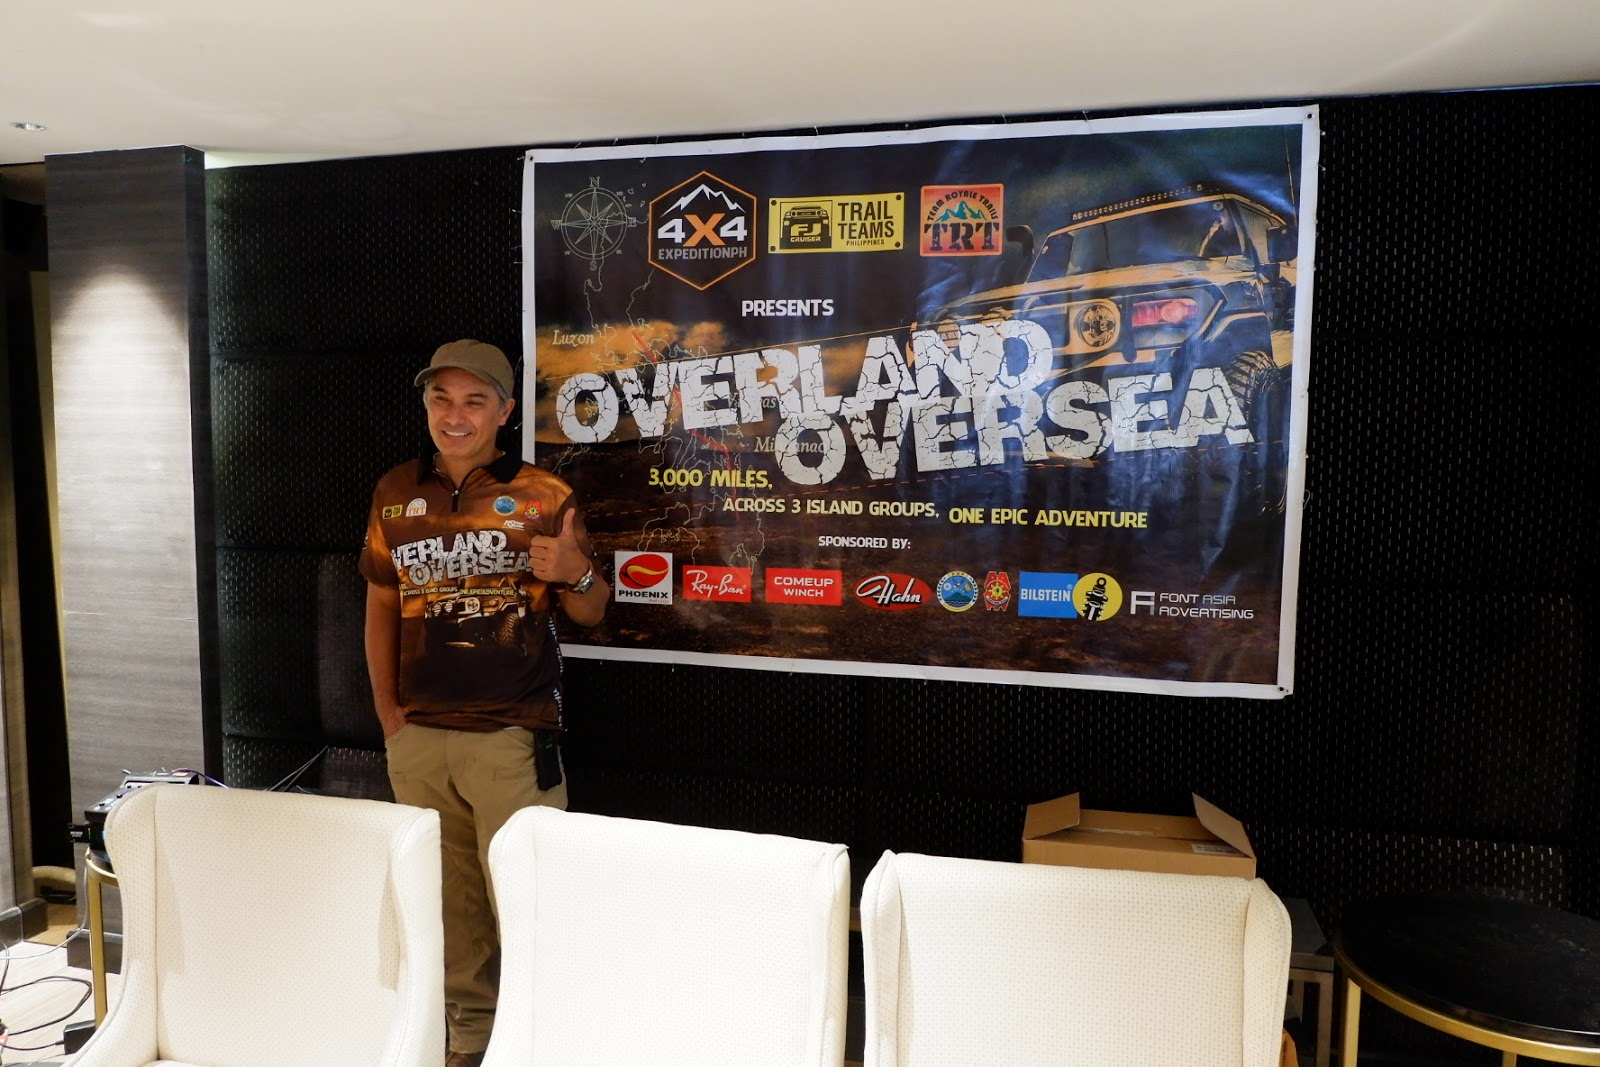 Filipino celebrity joined FJ Cruiser Philippines